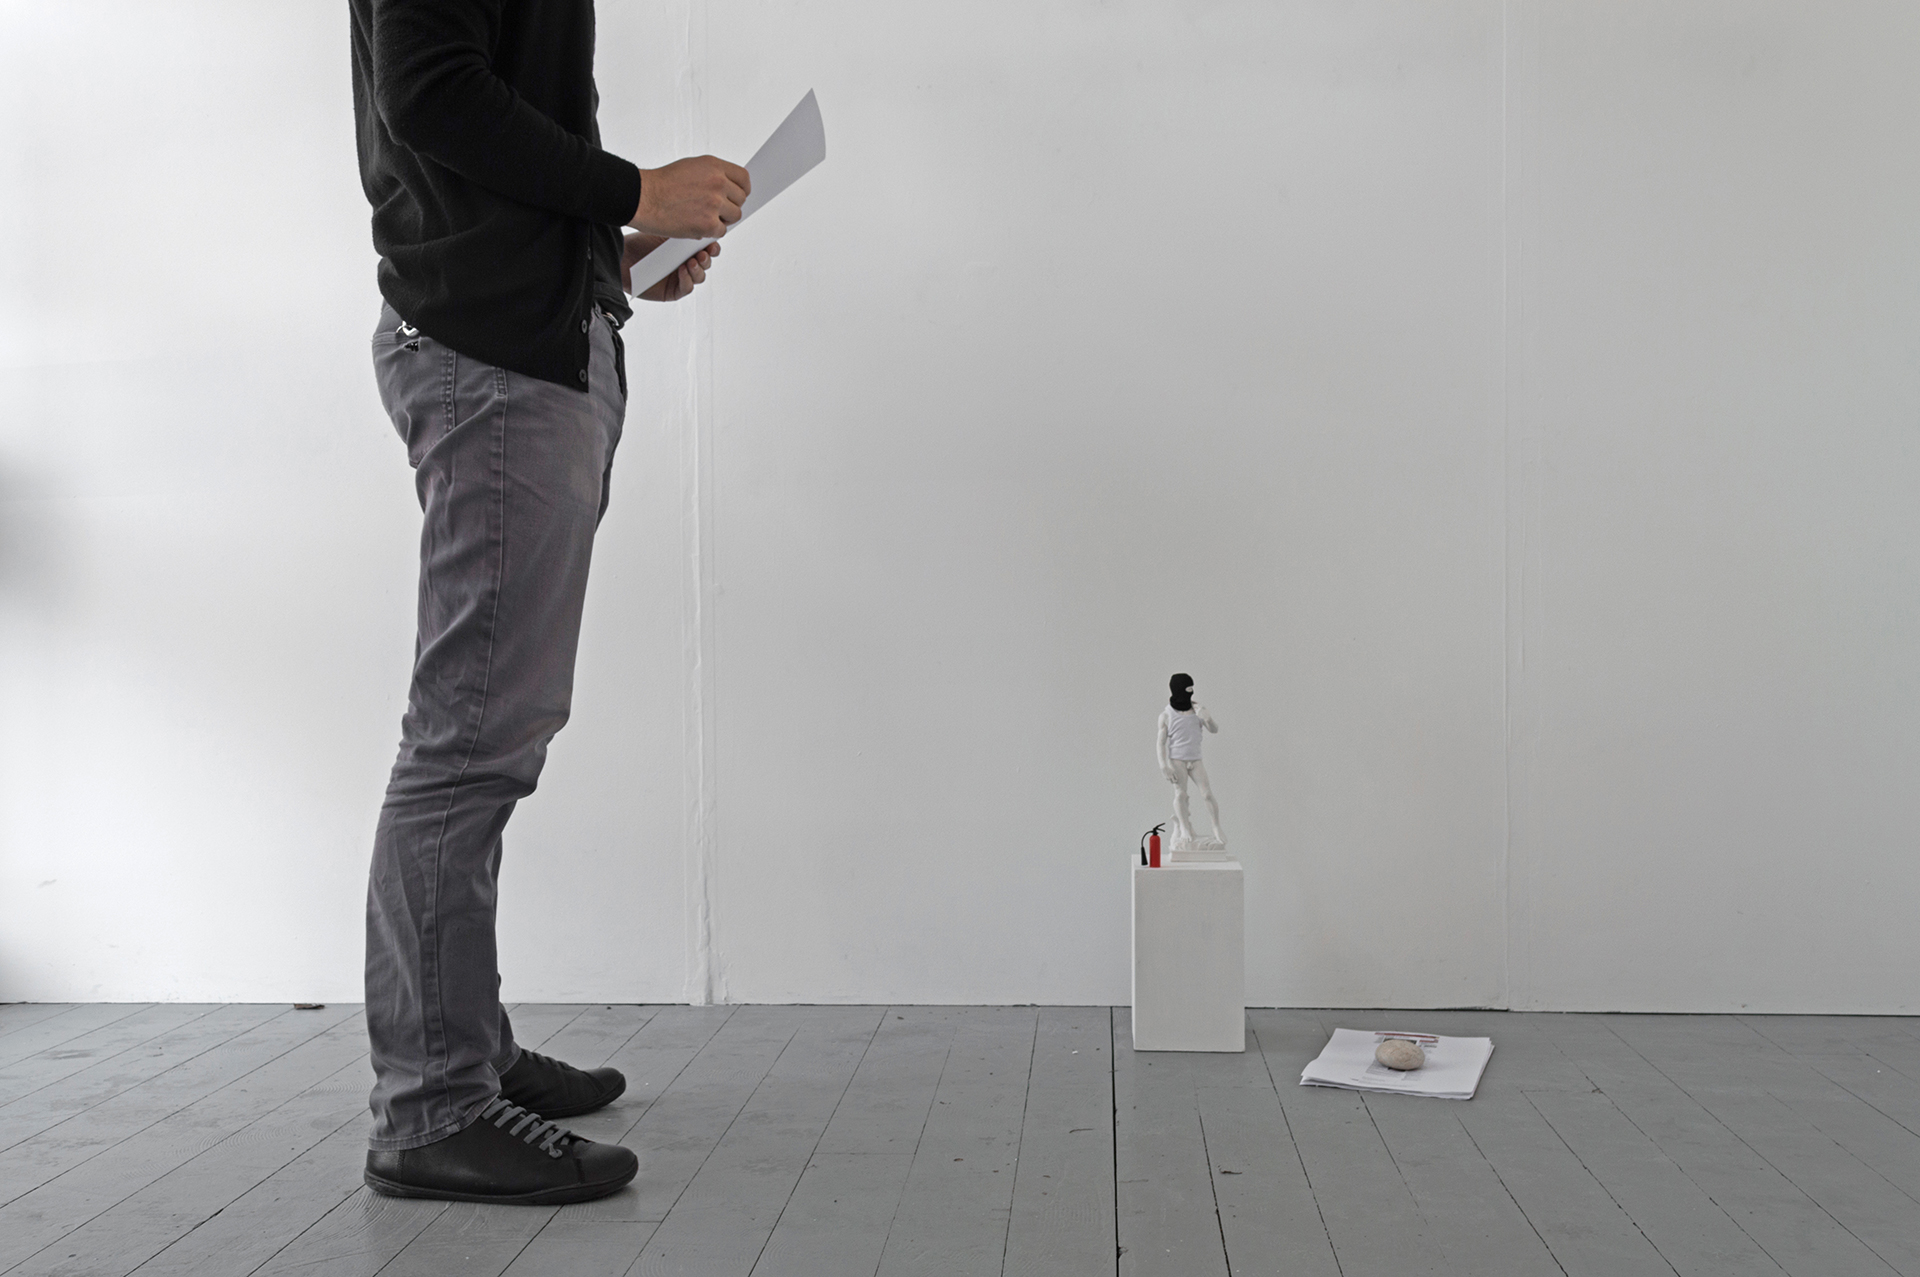 21 JULY 2001, marble powder cast, scale model clothing, fire extinguisher scale model, digital print, plinth. (Statue 45 x 20 cm; plinth 25 x 15 x 15cm), 2017.